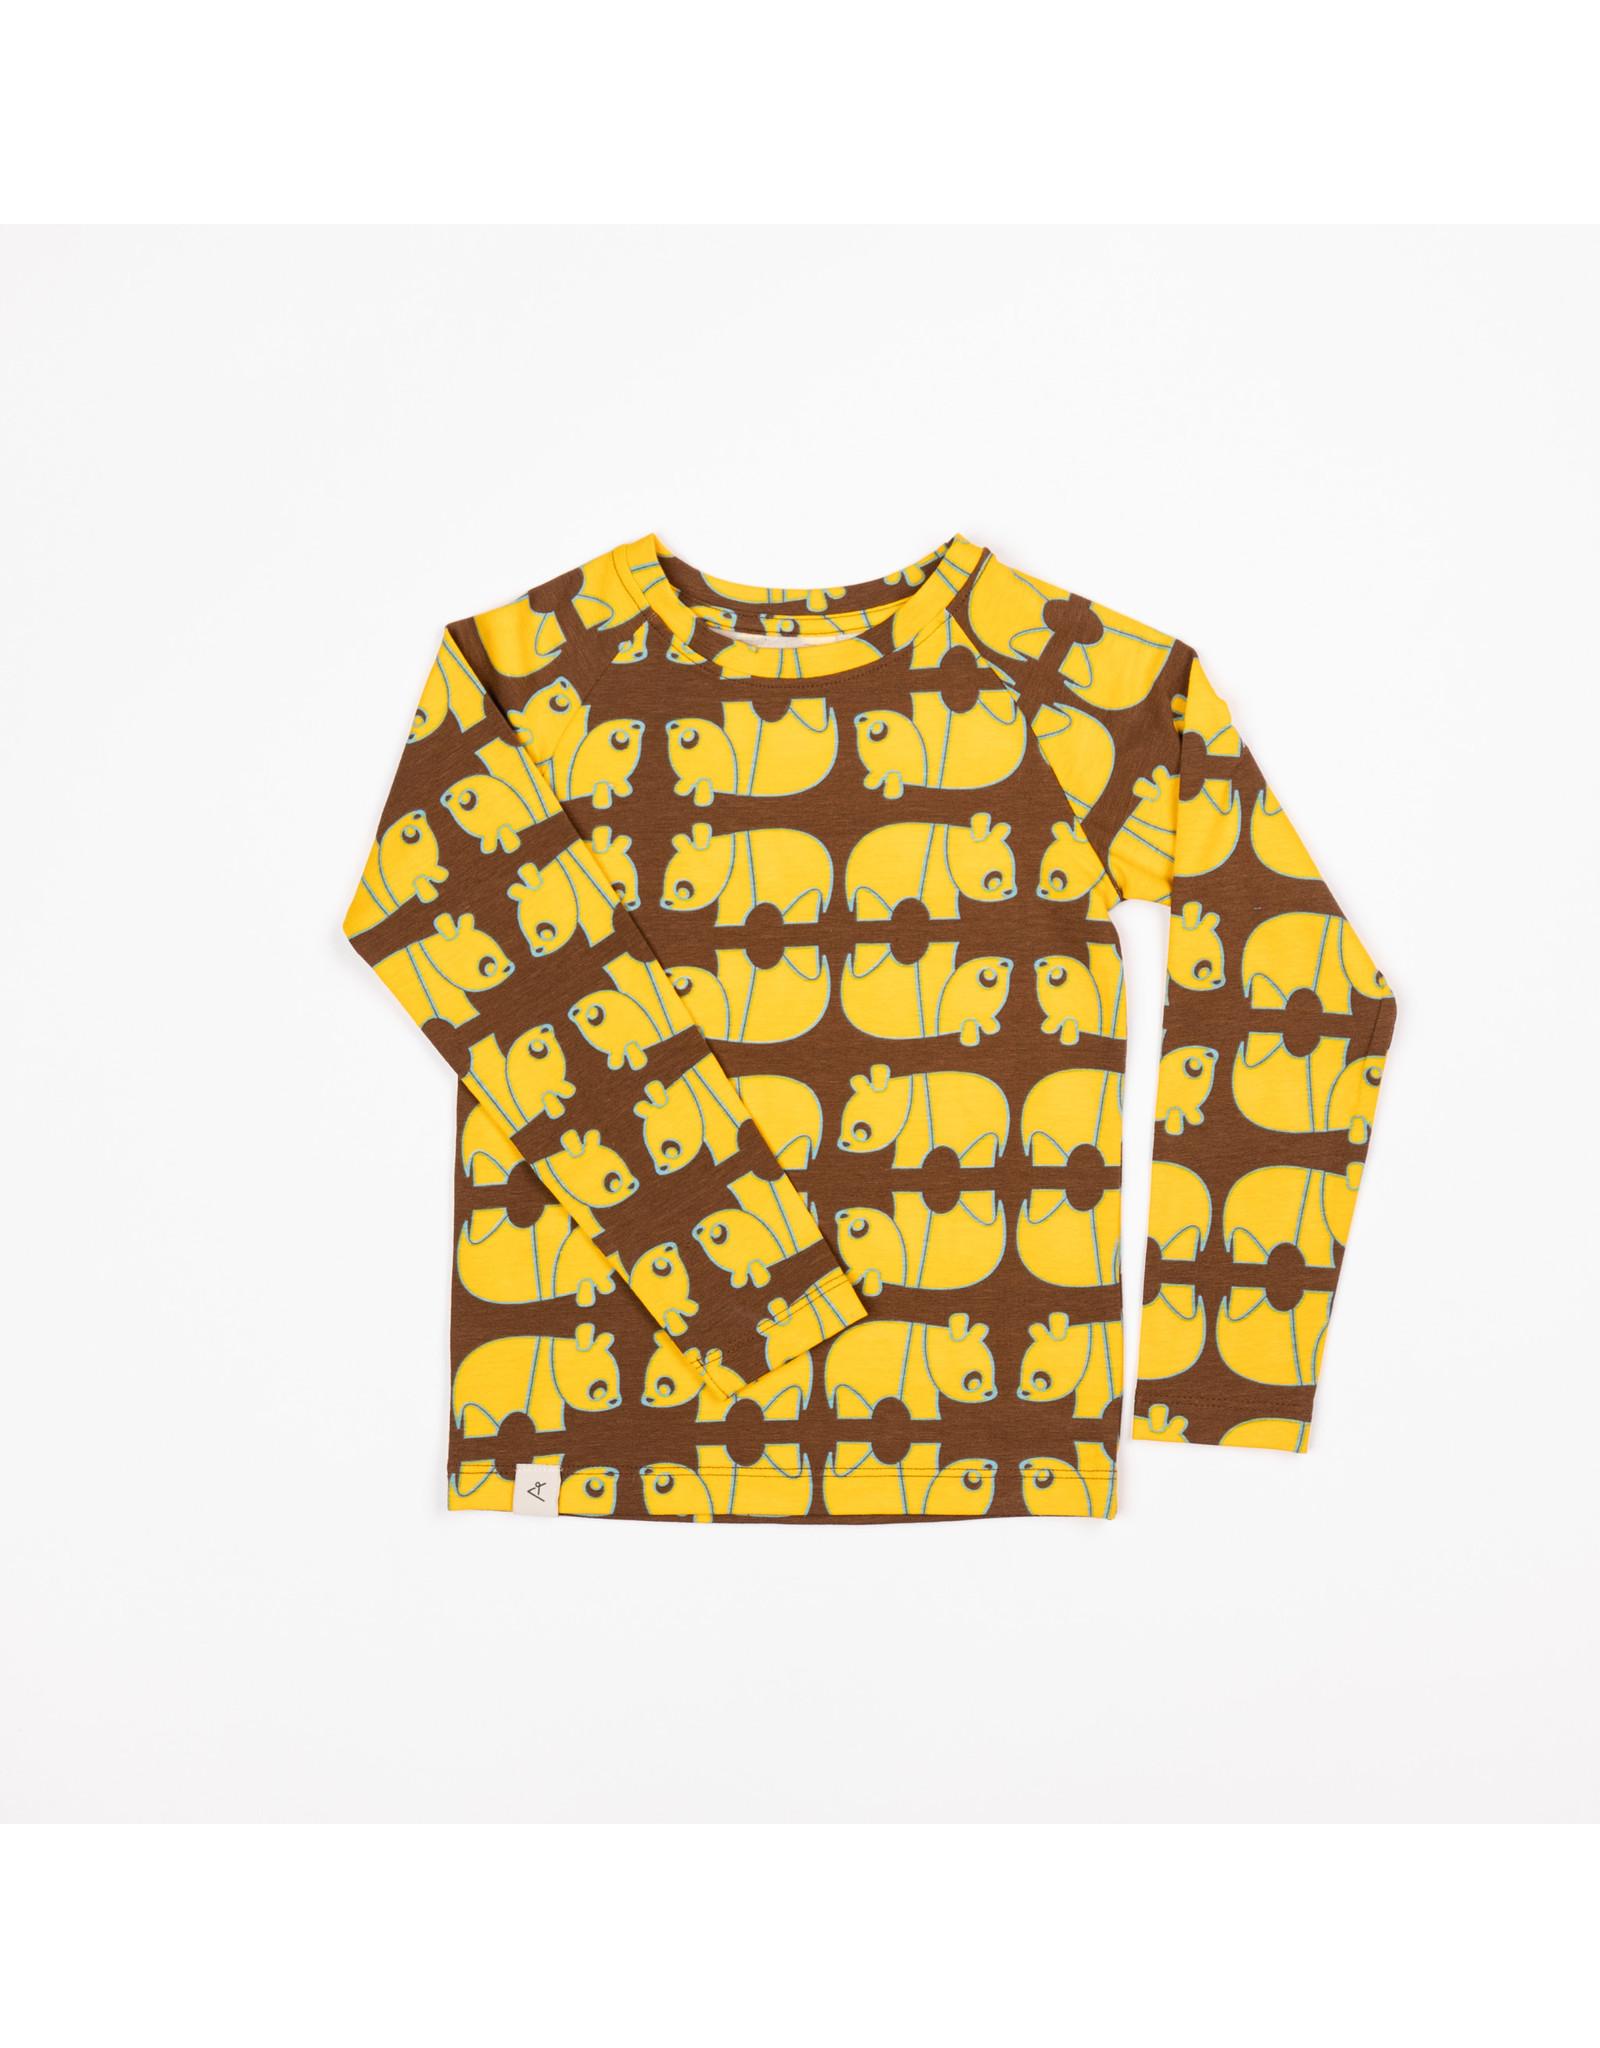 ALBA of Denmark Bruine t-shirt met gele panda's